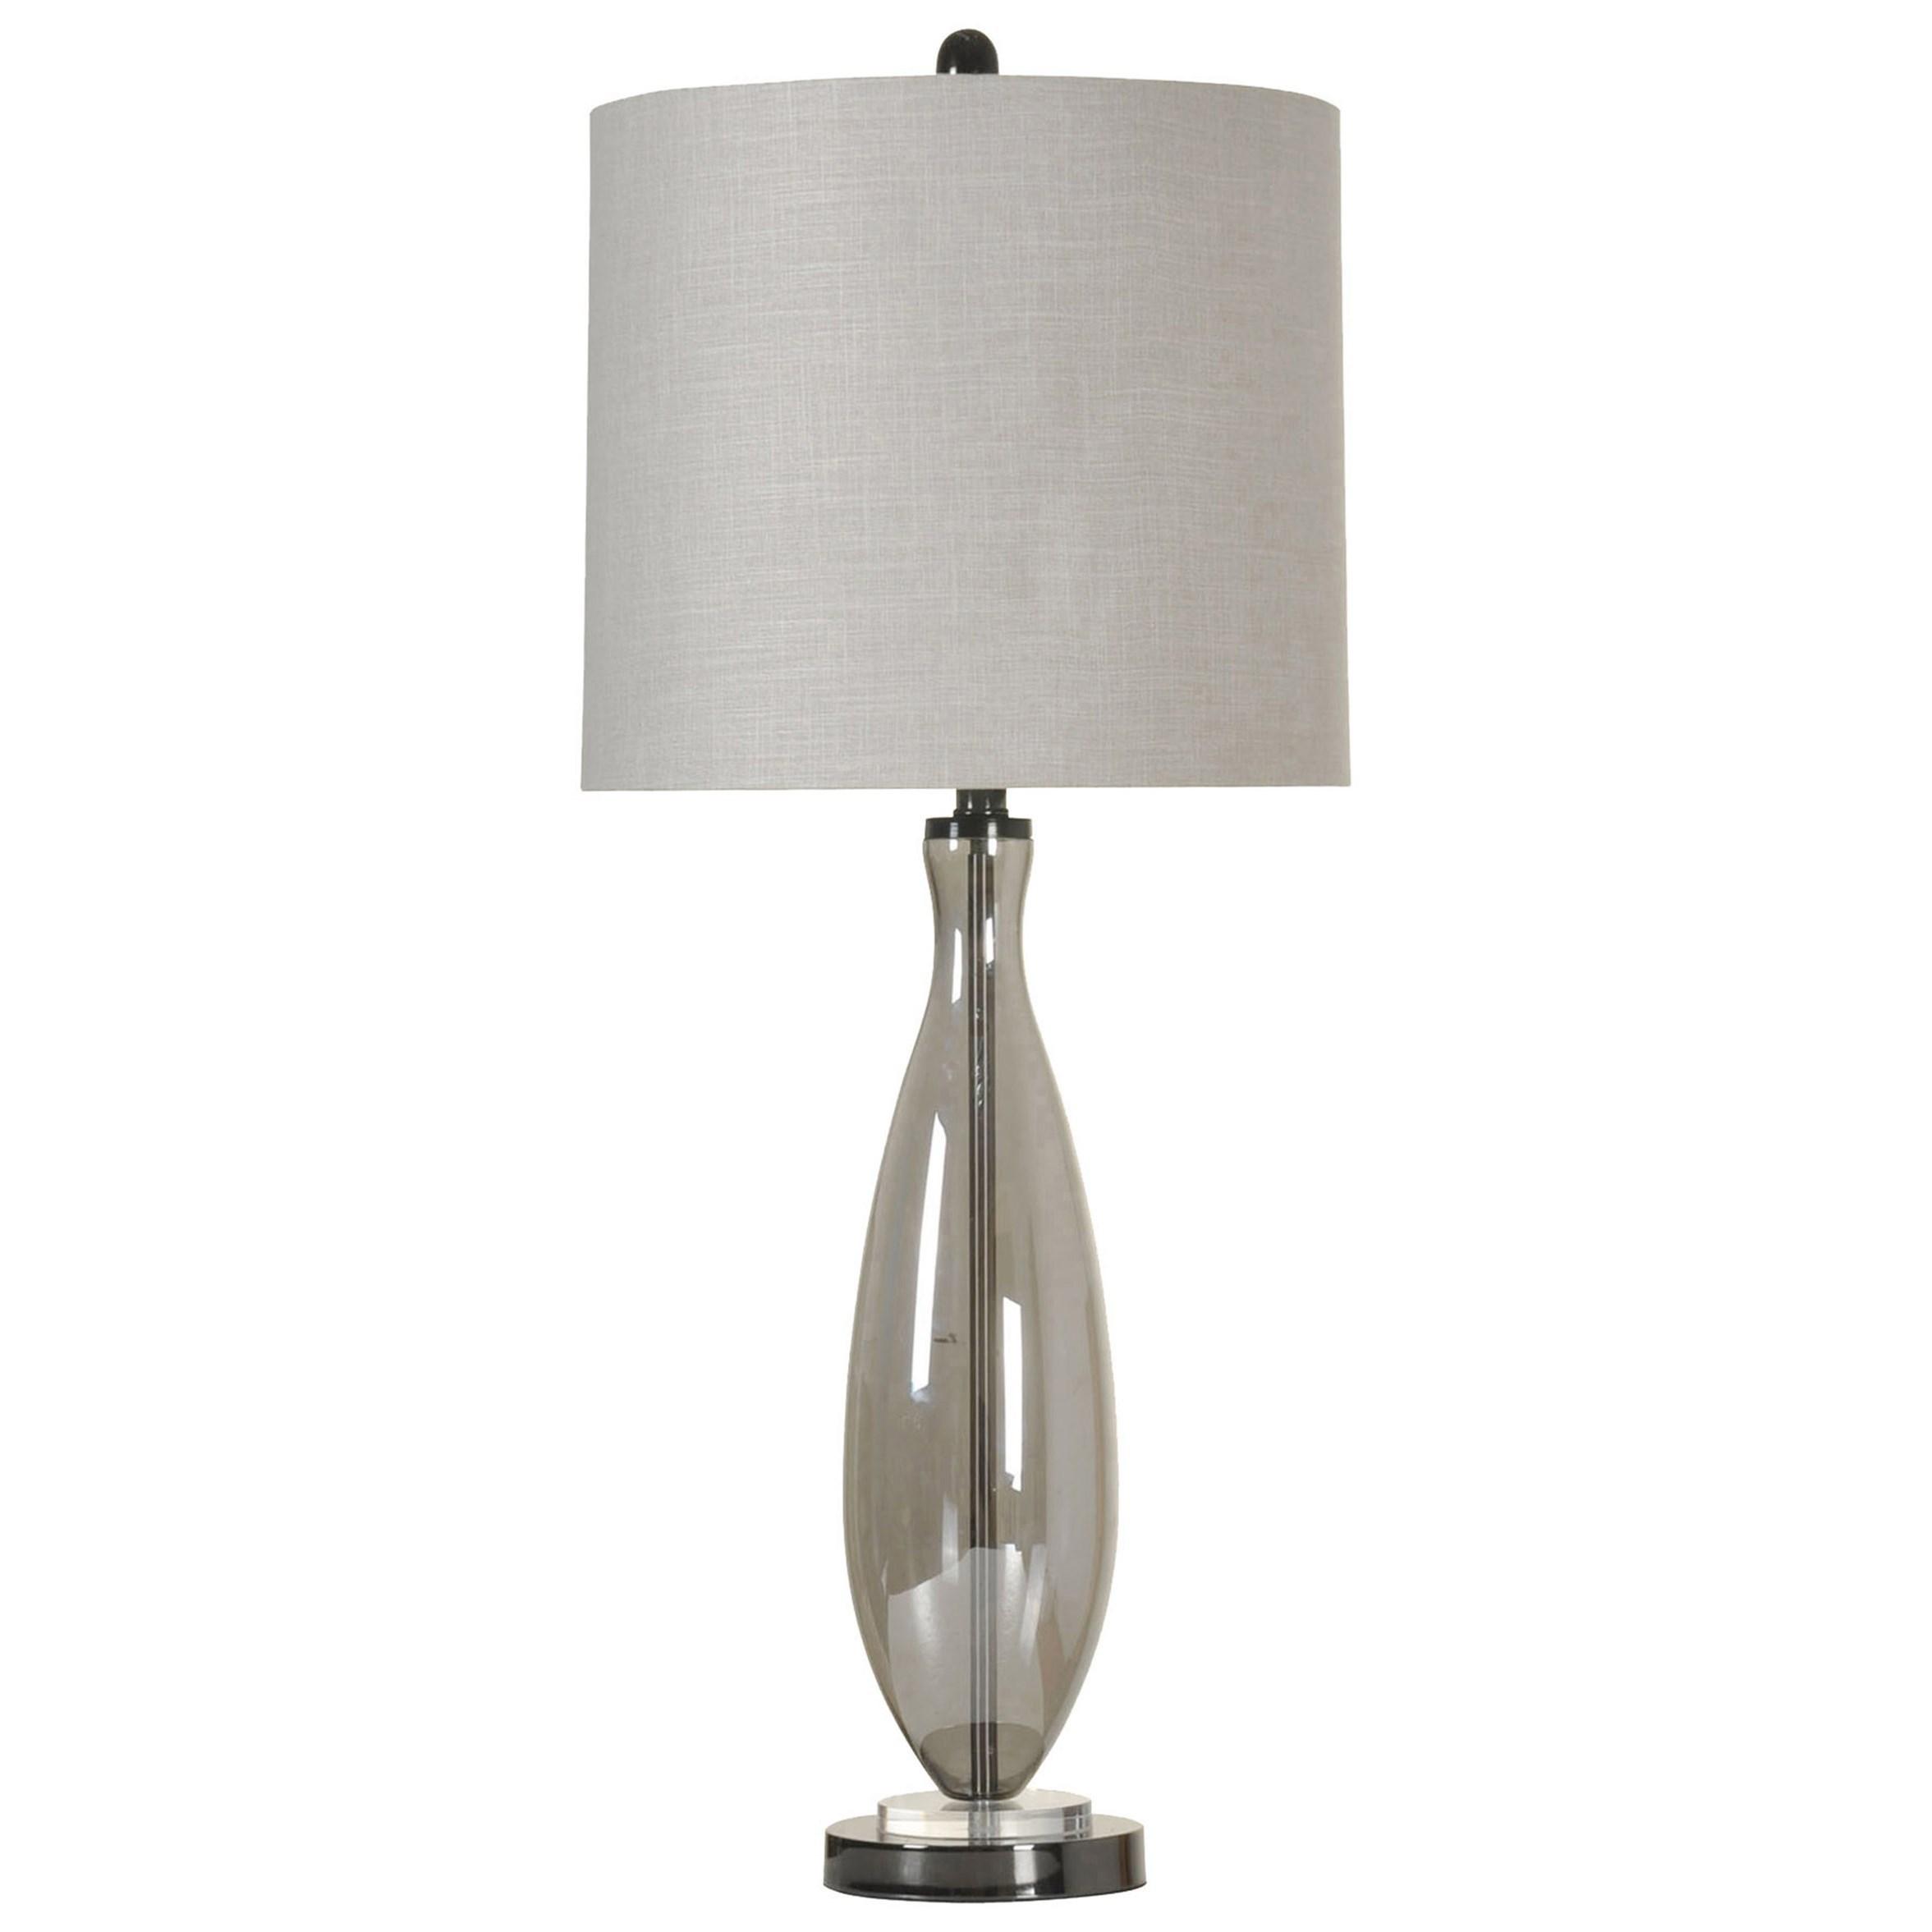 Lamps Smoke Glass Table Lamp at Ruby Gordon Home